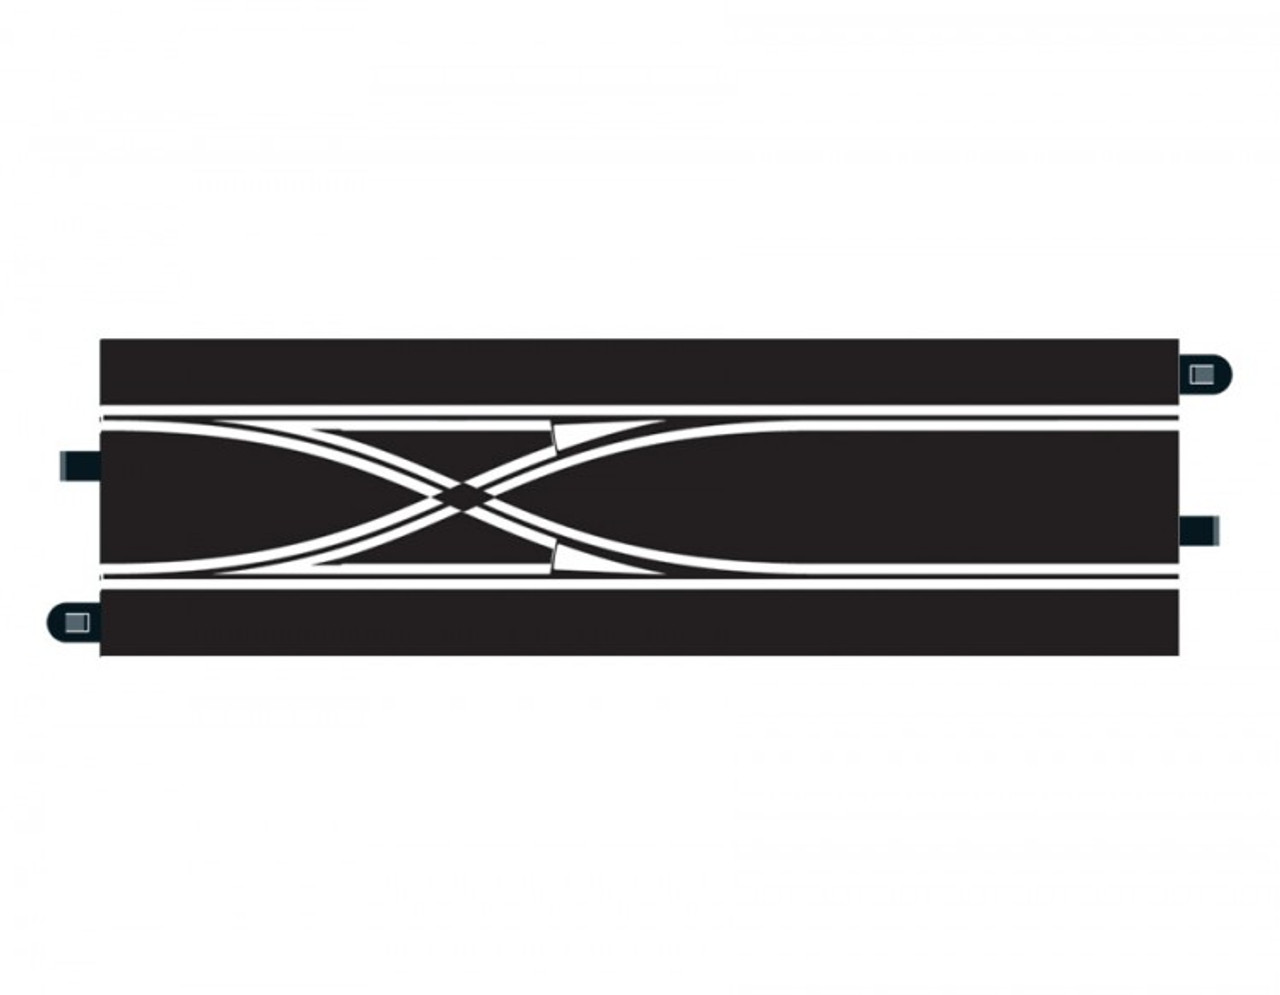 Scalextric C7036 Straight Lane Change Track Slot Car Digital Accessories